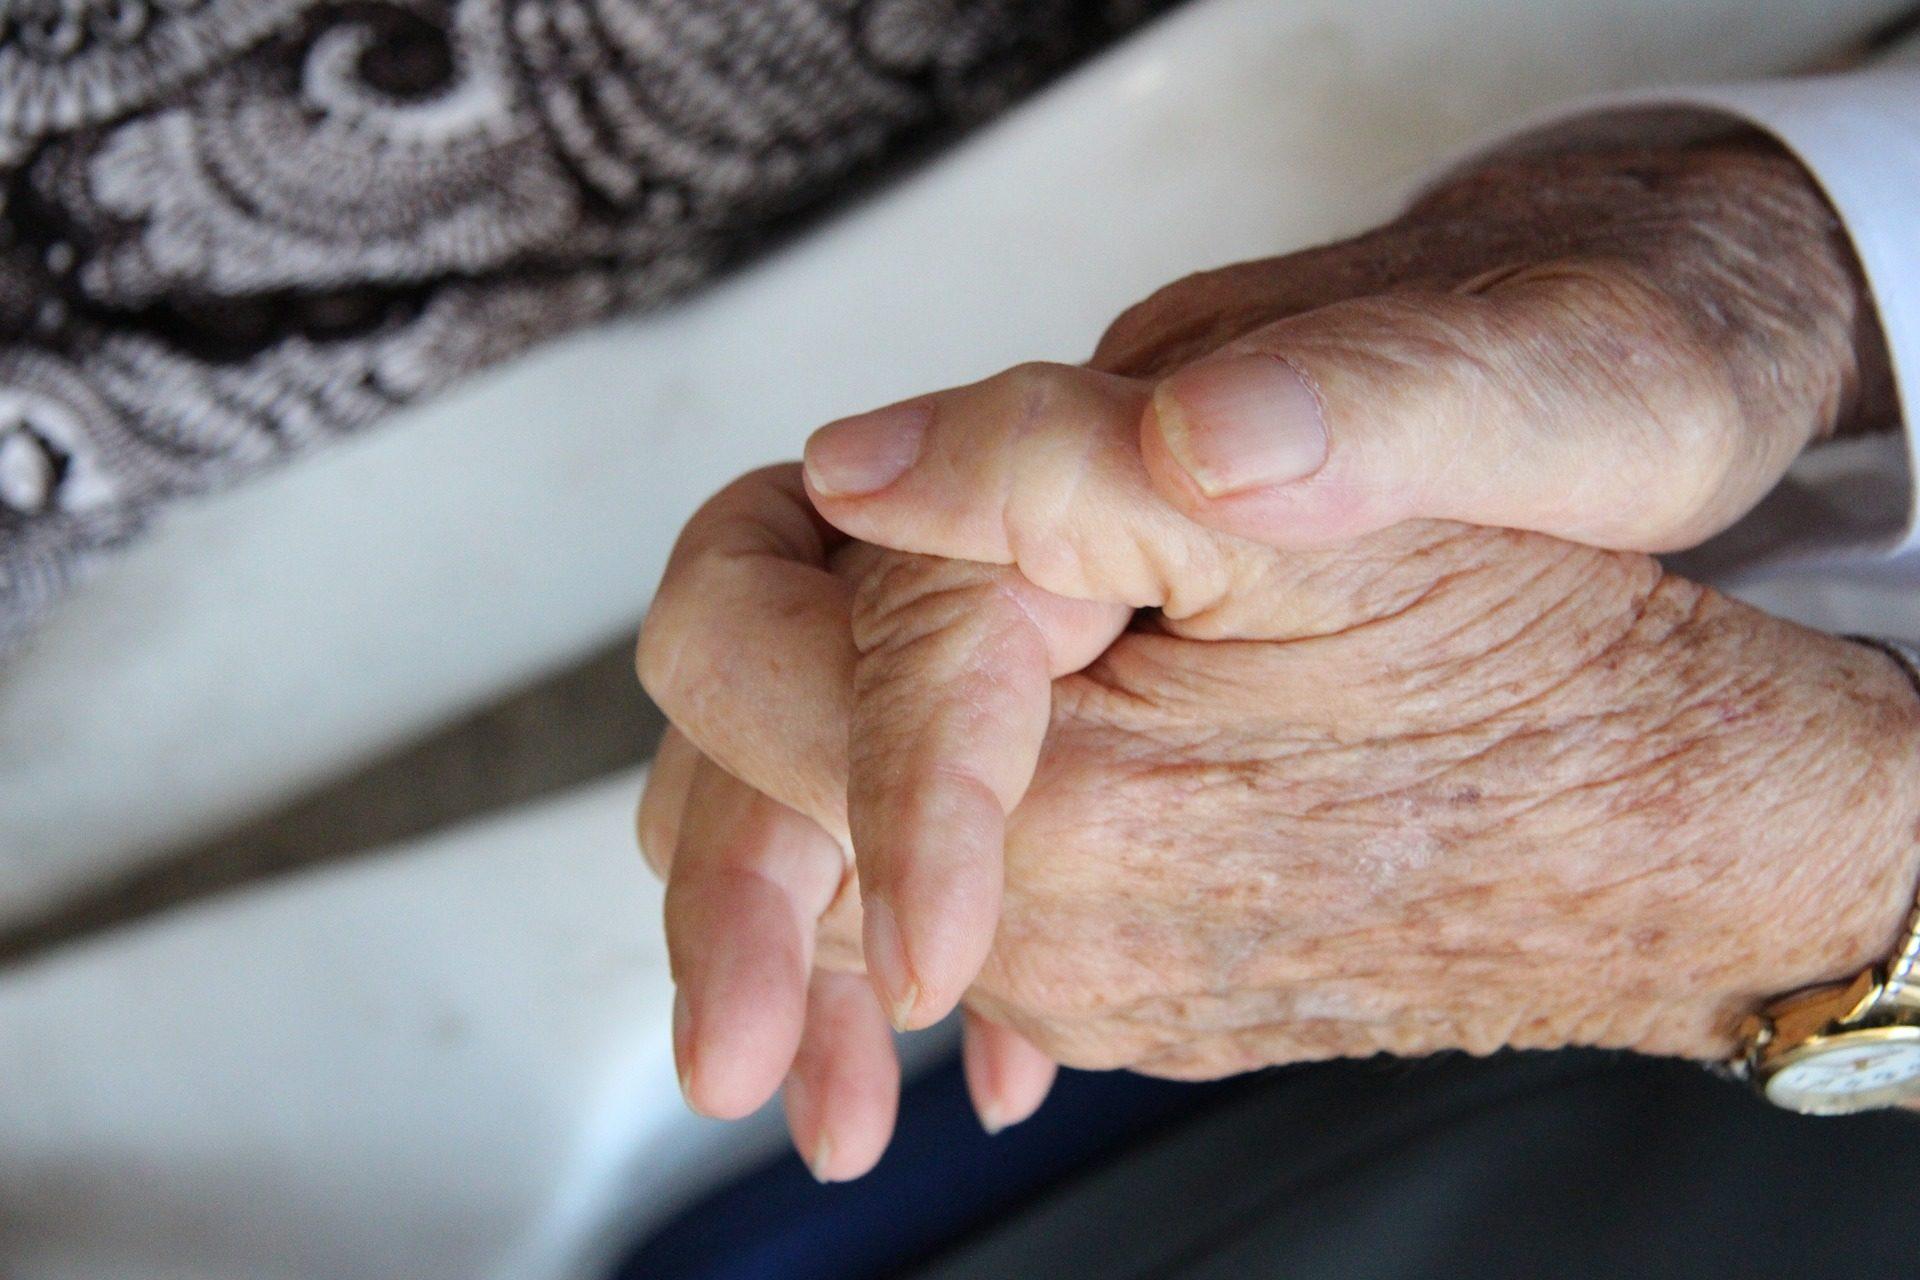 mani, rughe, vecchiaia, esperienza, vita, senescenza - Sfondi HD - Professor-falken.com